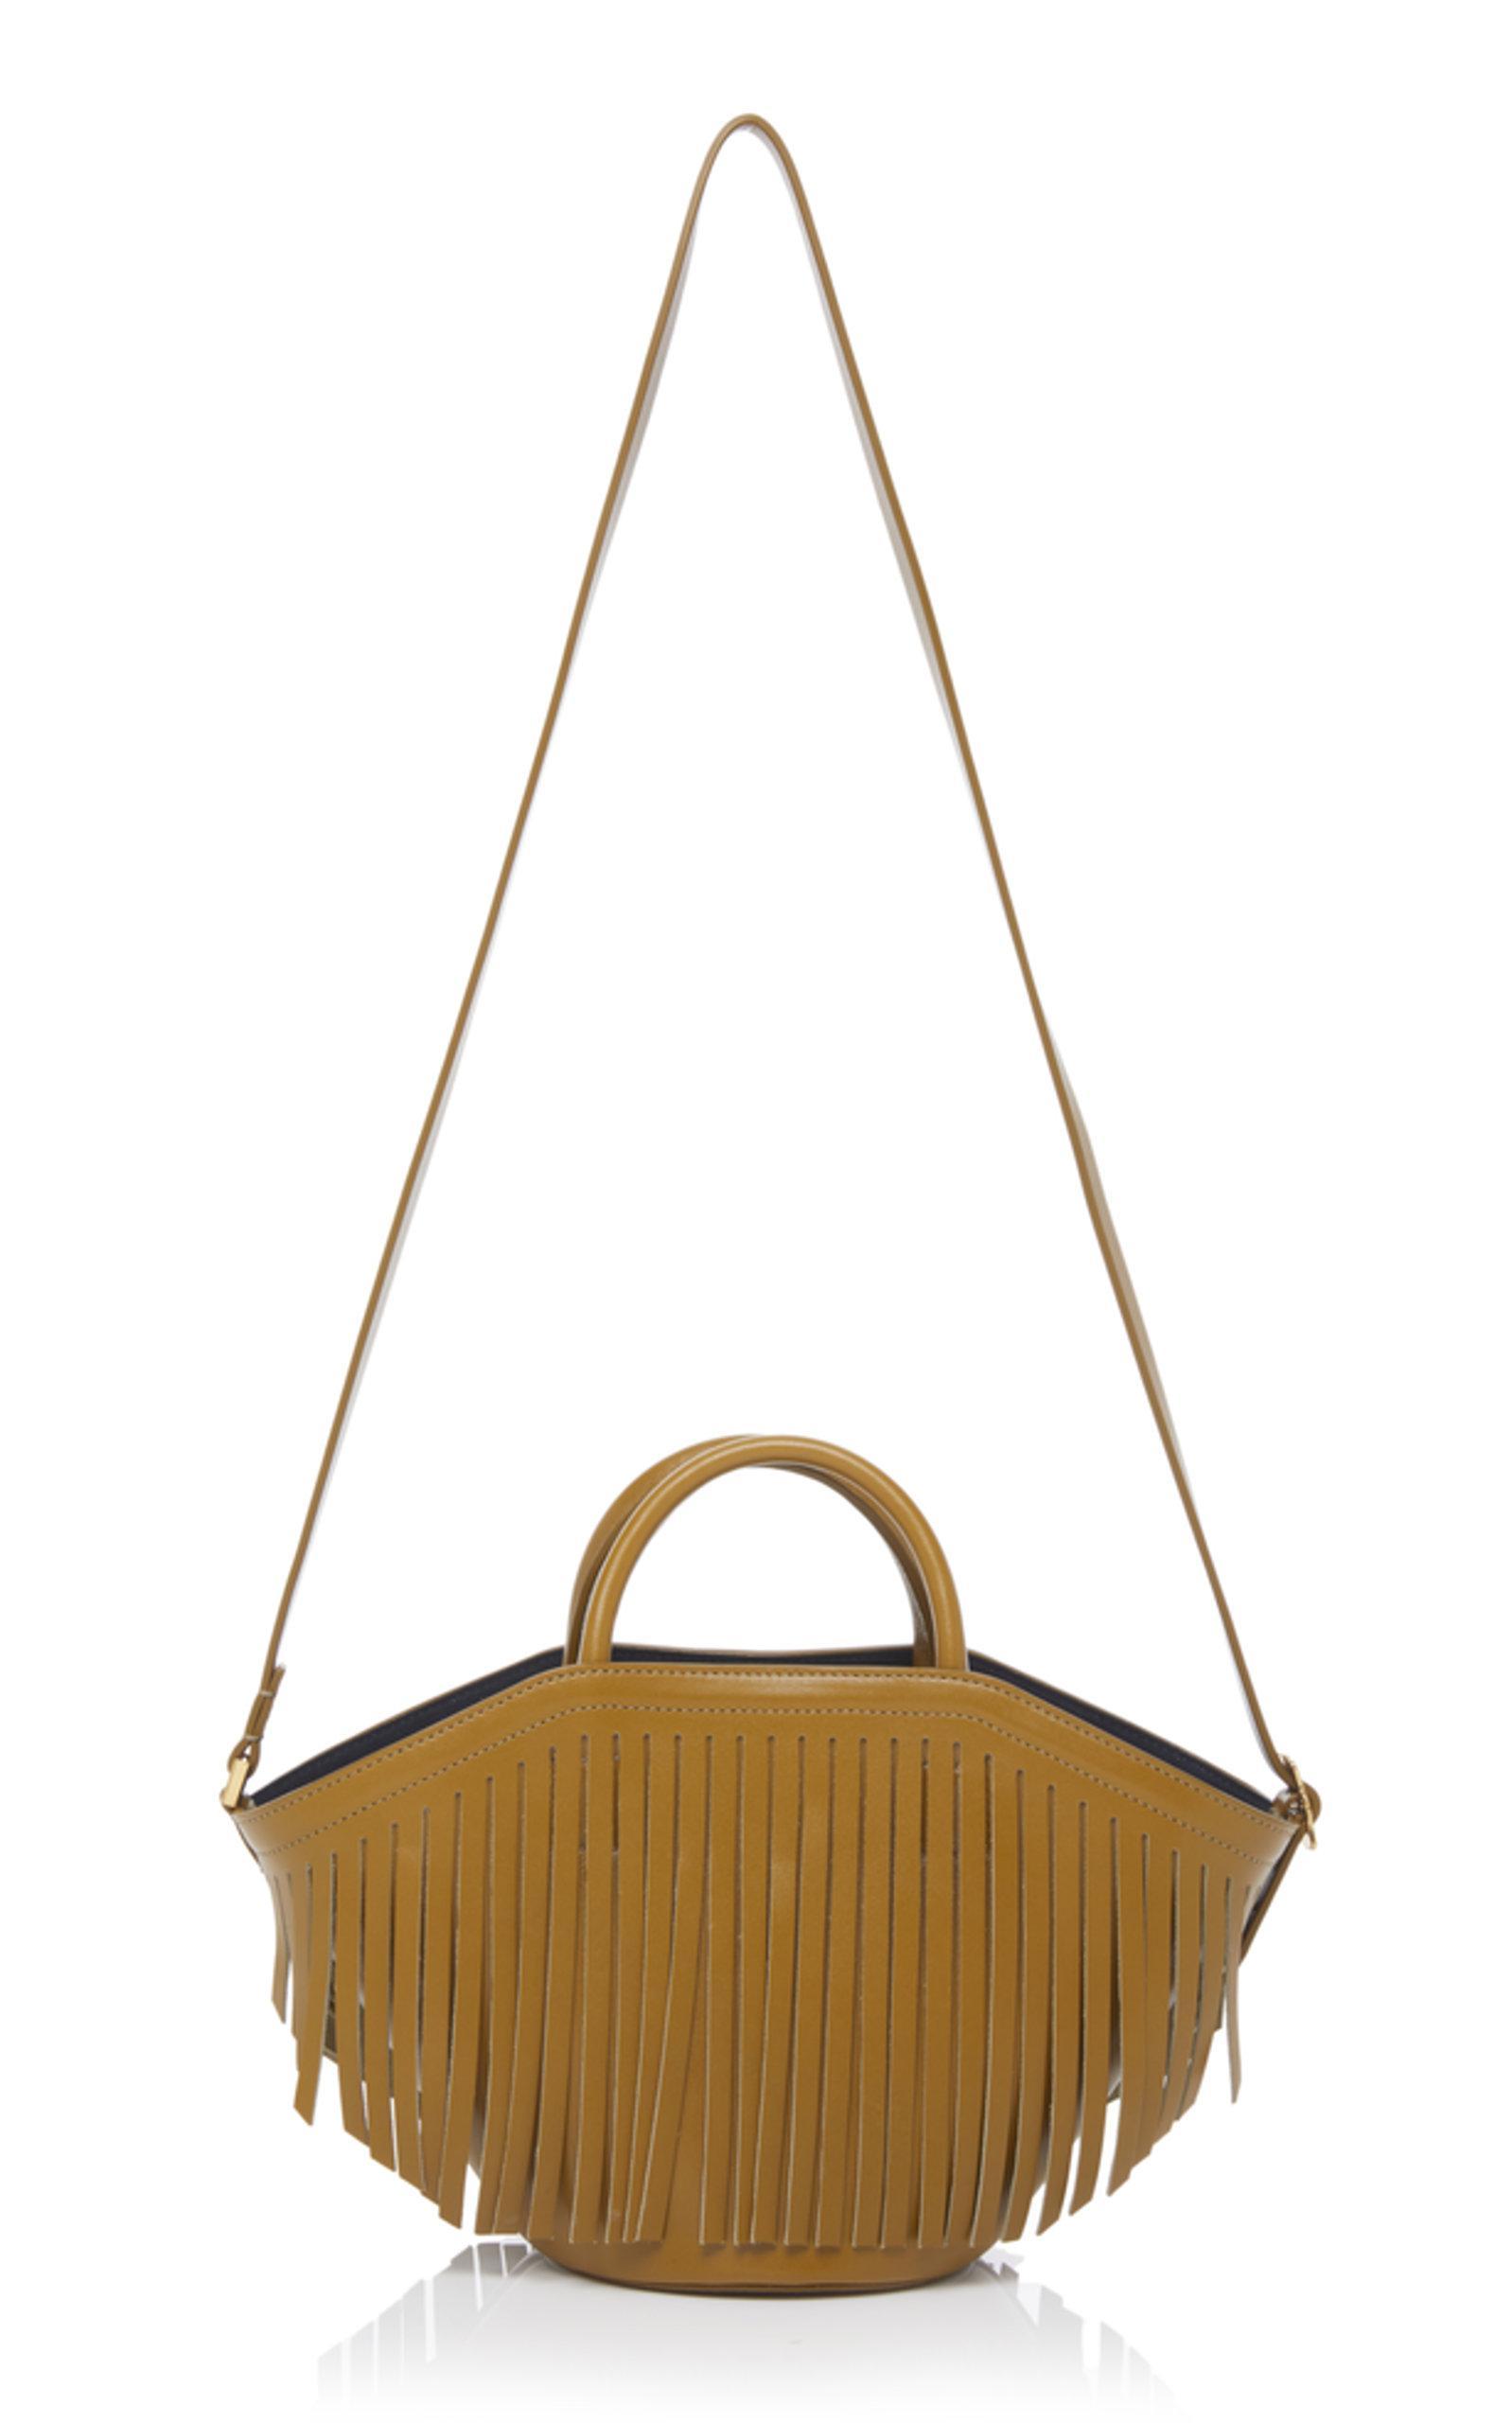 Small Fringe Basket Trademark aFAiw